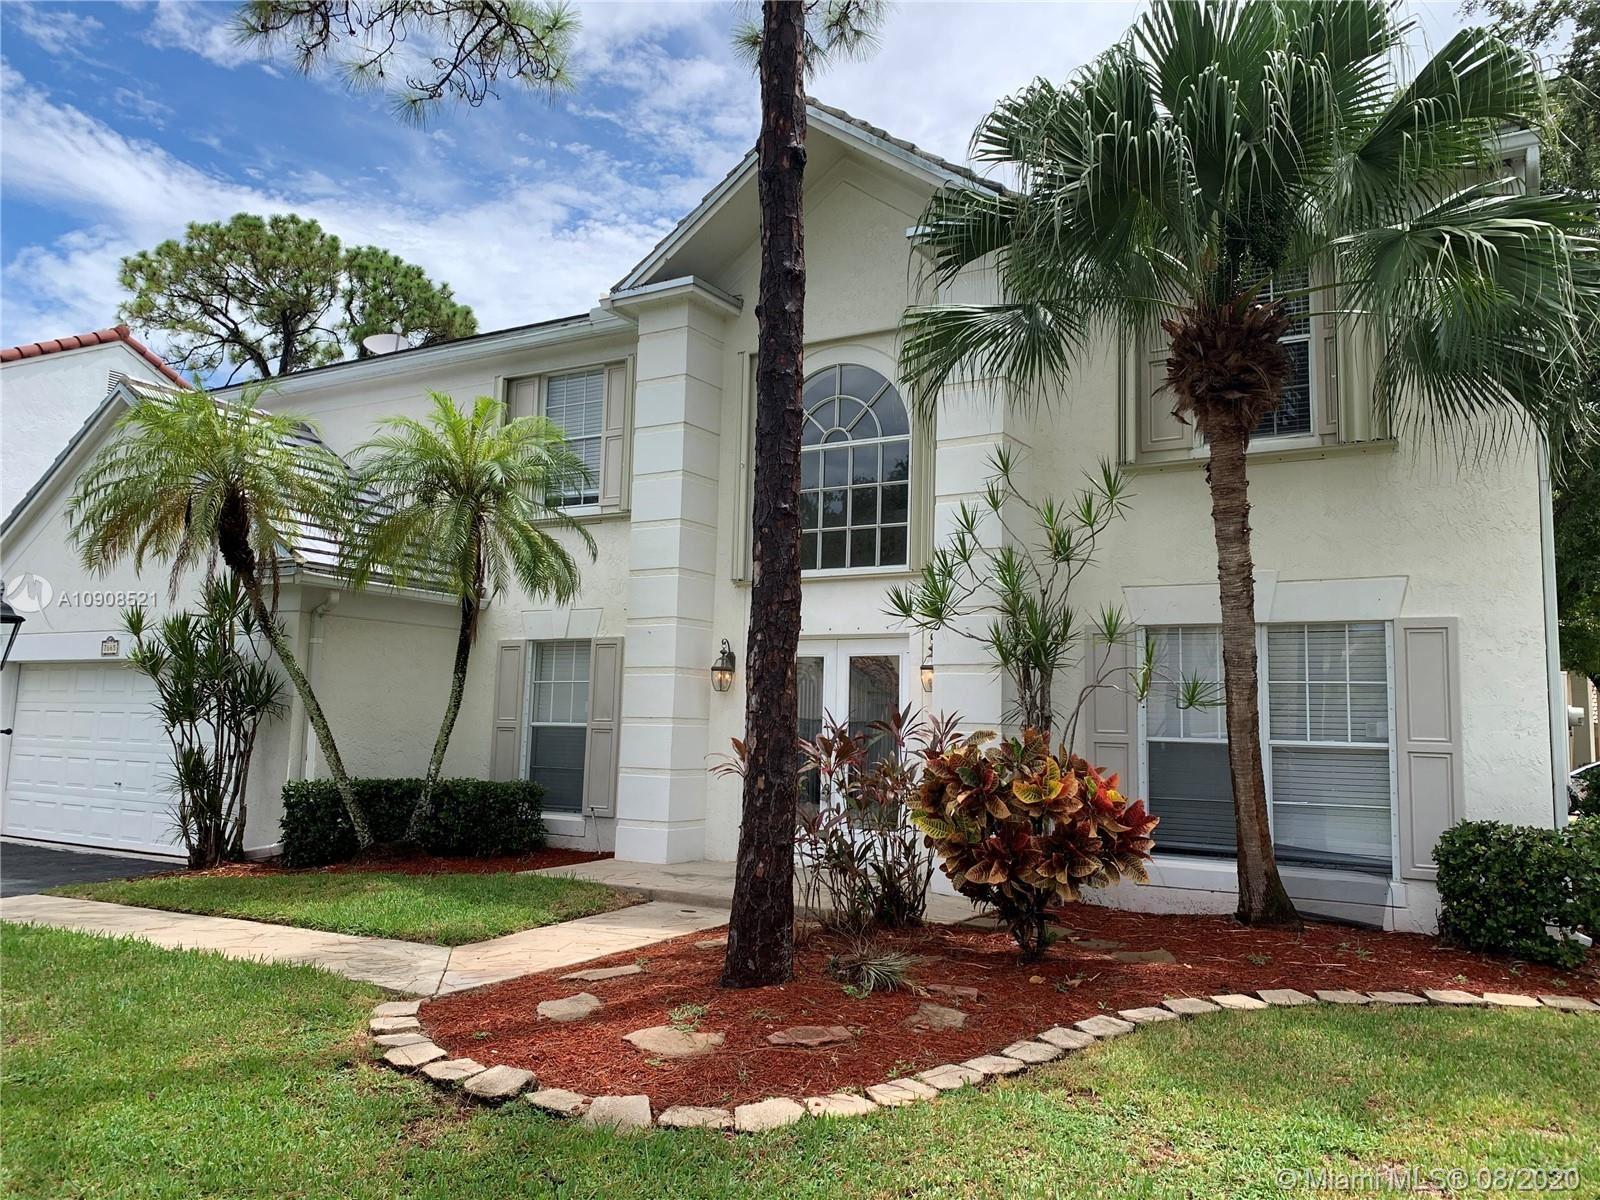 7665 Live Oak Dr, Coral Springs, FL 33065 - #: A10908521